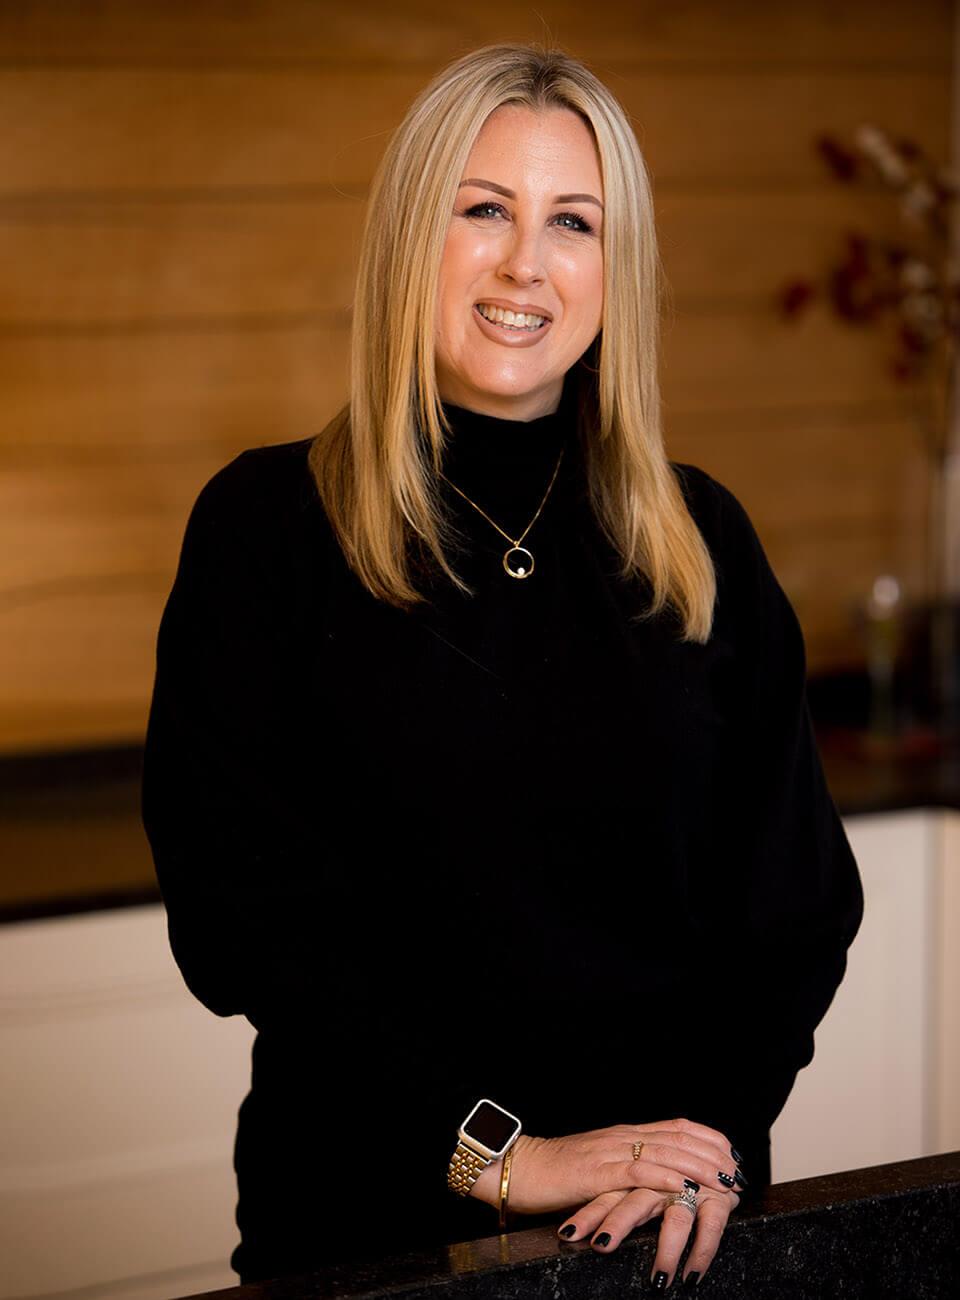 Taryn Ordonio at Classic Kitchens & Designs in Monterey, CA